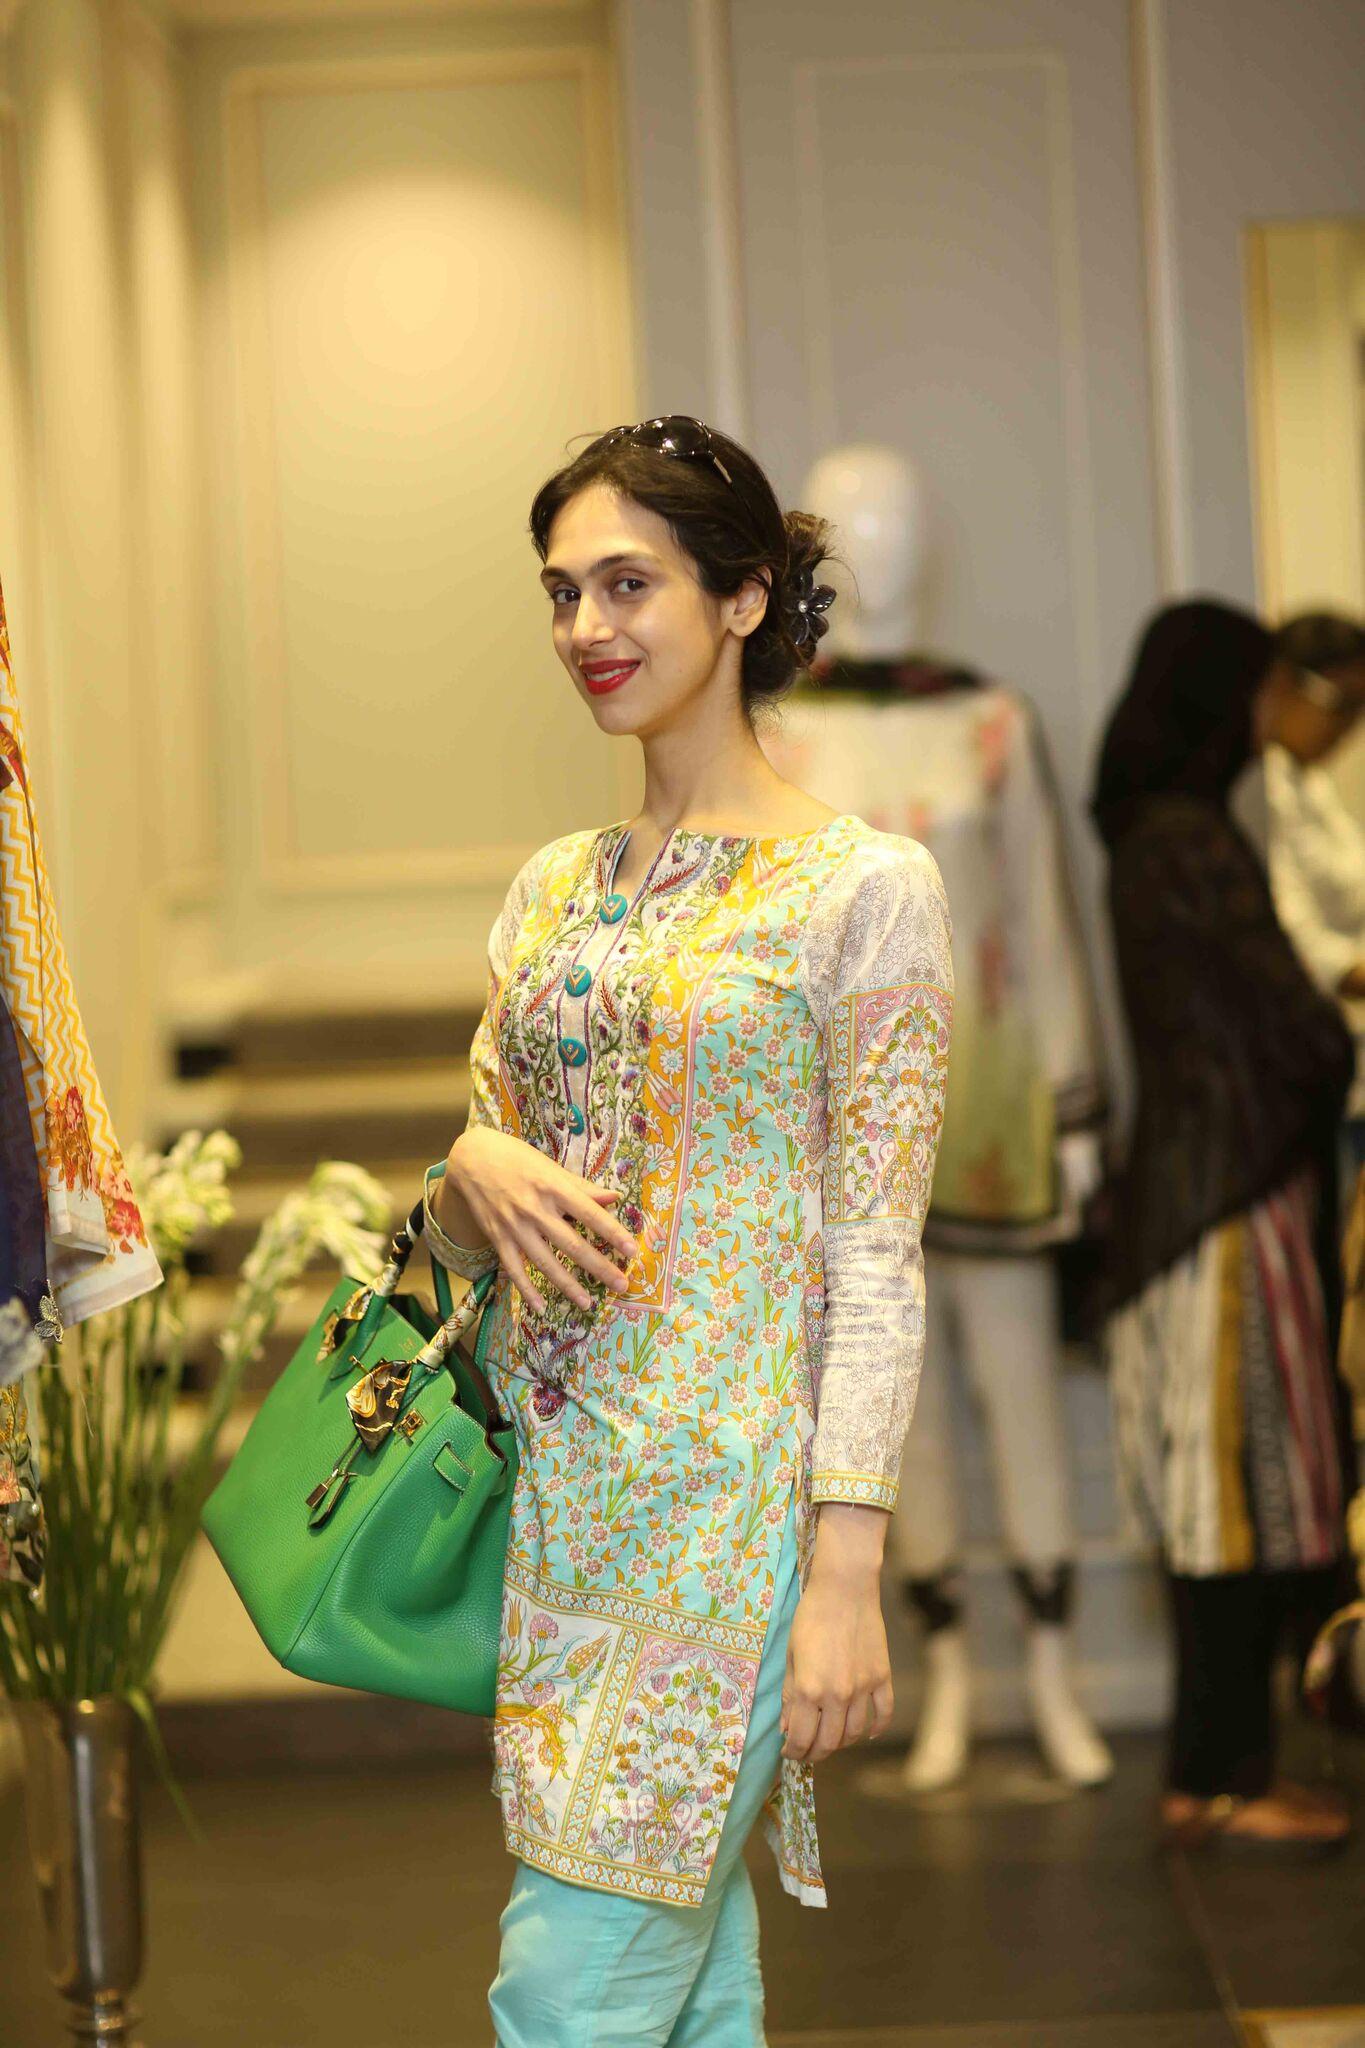 Saira Rizwan Allure Eid Exhibition - Natural Health News